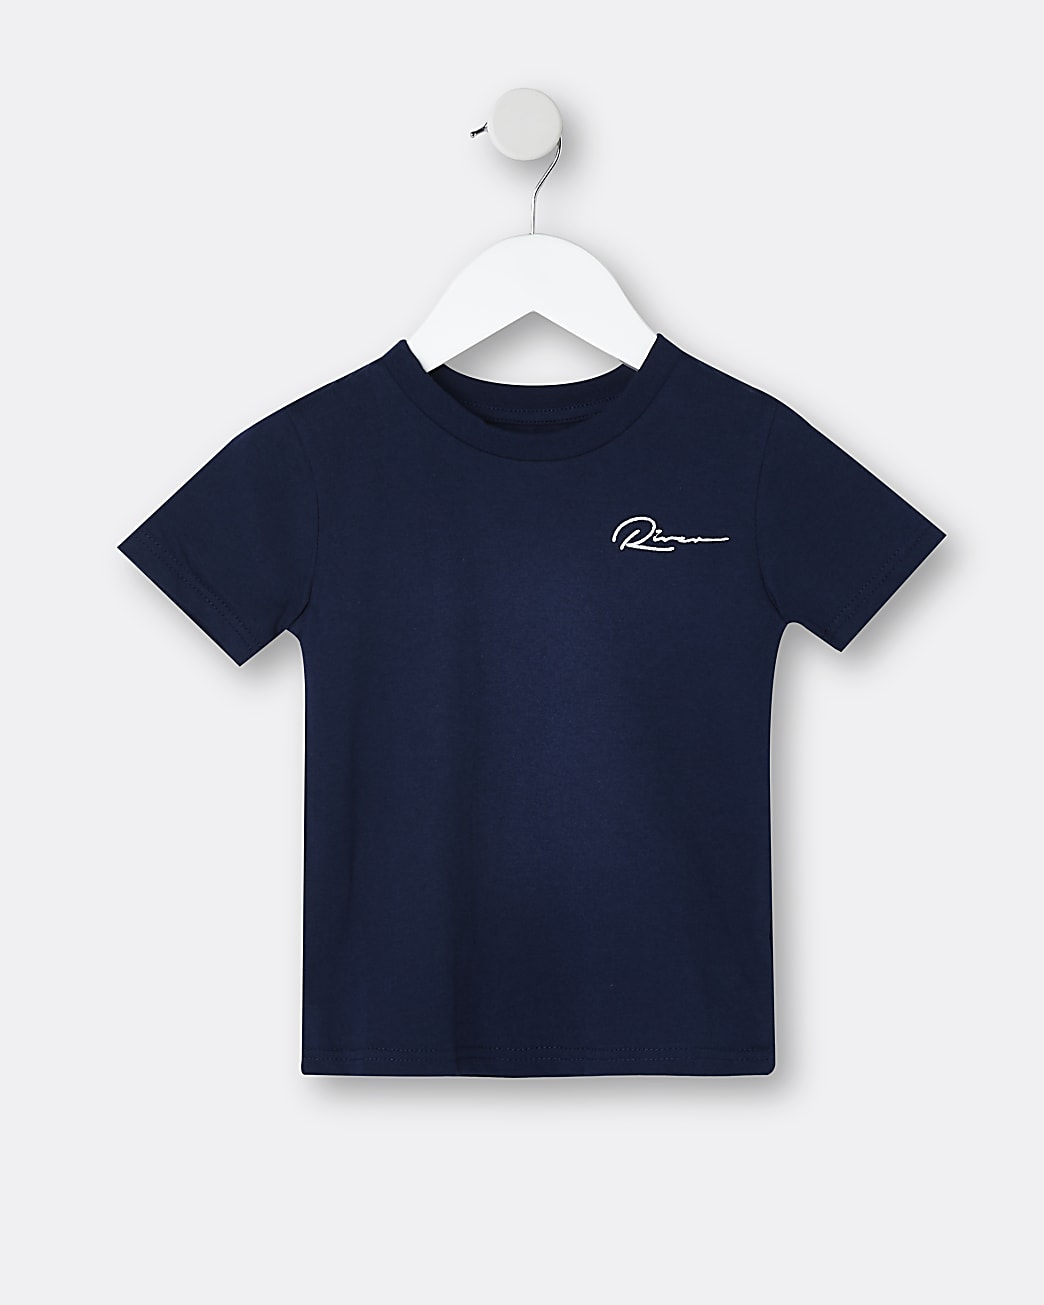 Mini boys 'River' embroidered t-shirt